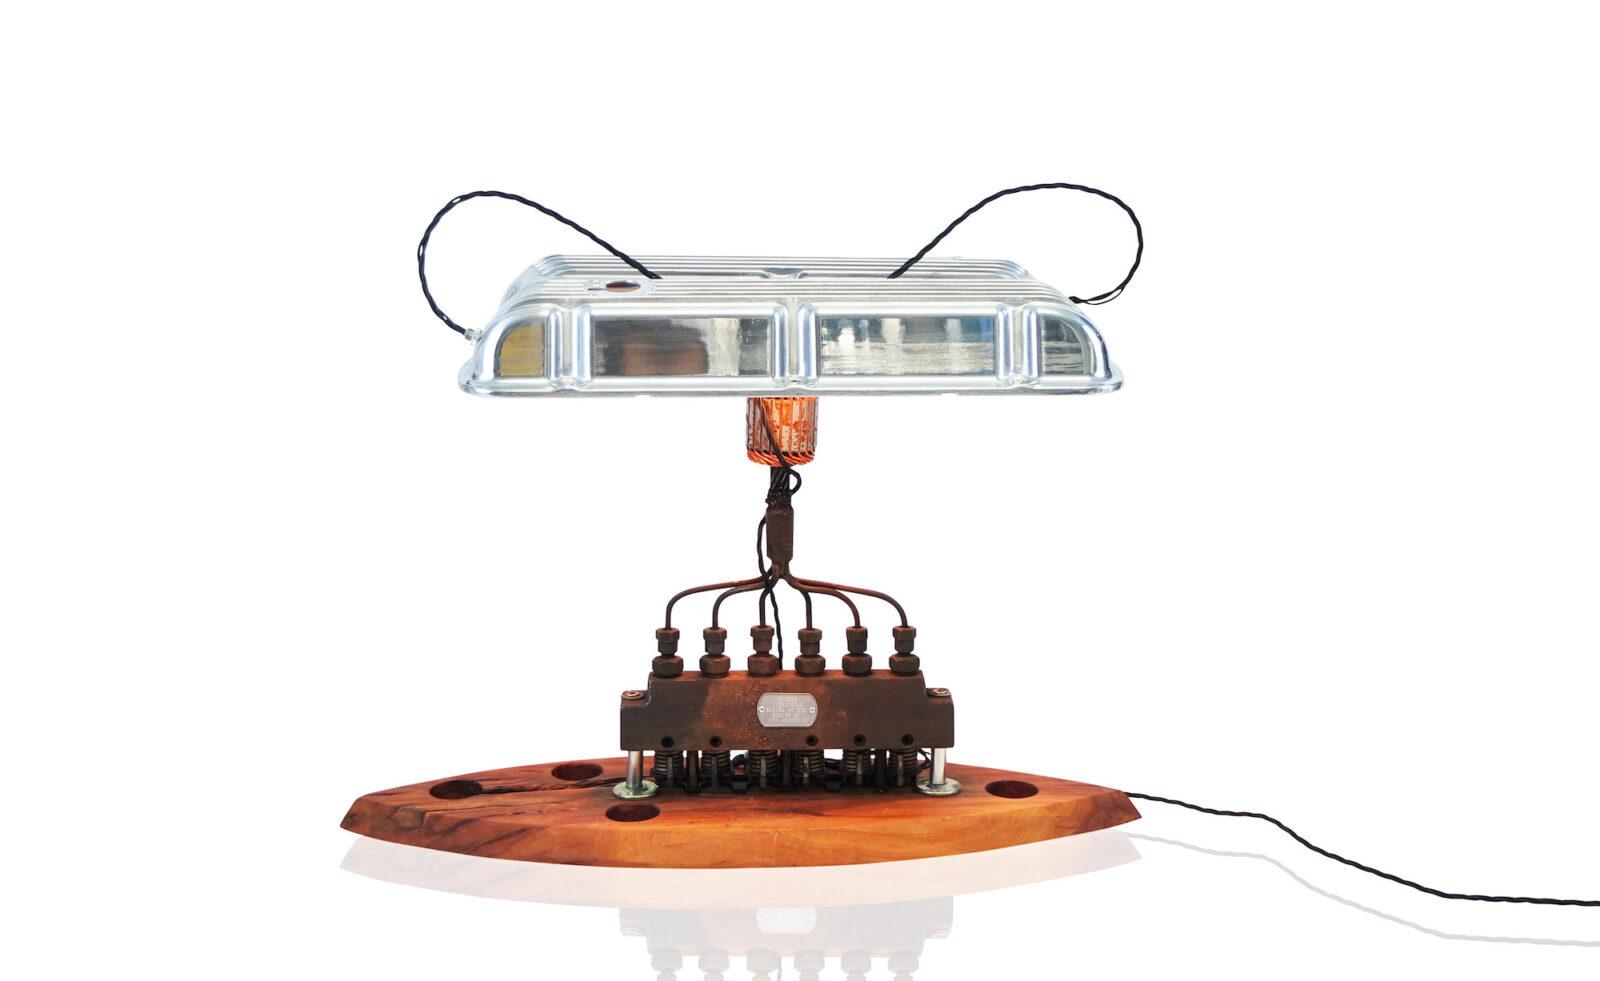 V8 Engine Lamp 1600x981 - Unibro Design V8 Lamp